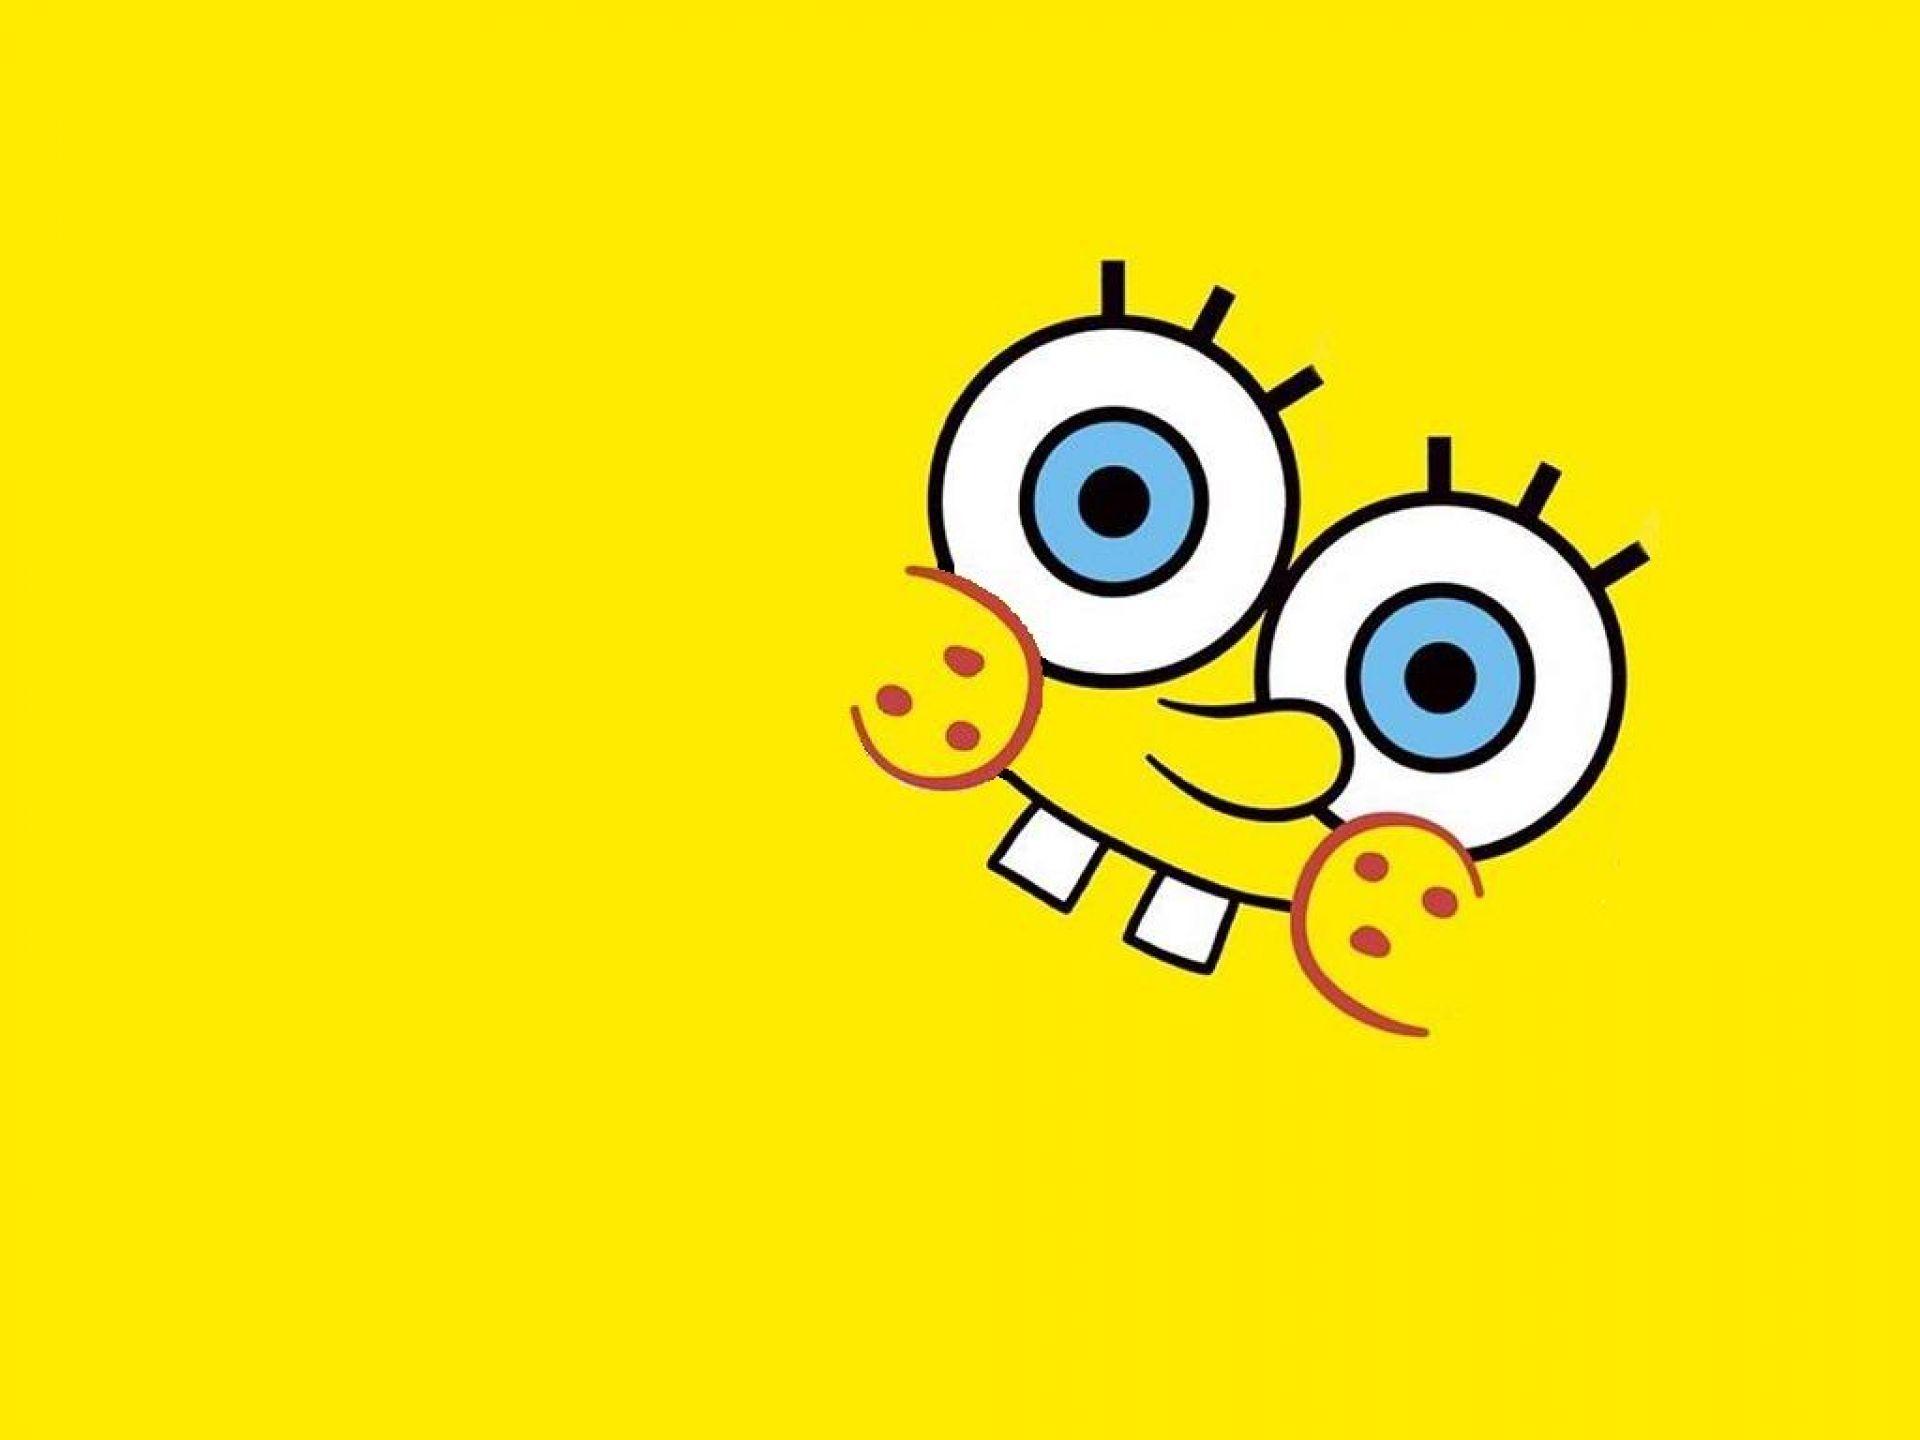 Spongebob Face Yellow Background Wallpaper Spongebob Wallpaper Cute Wallpapers Spongebob